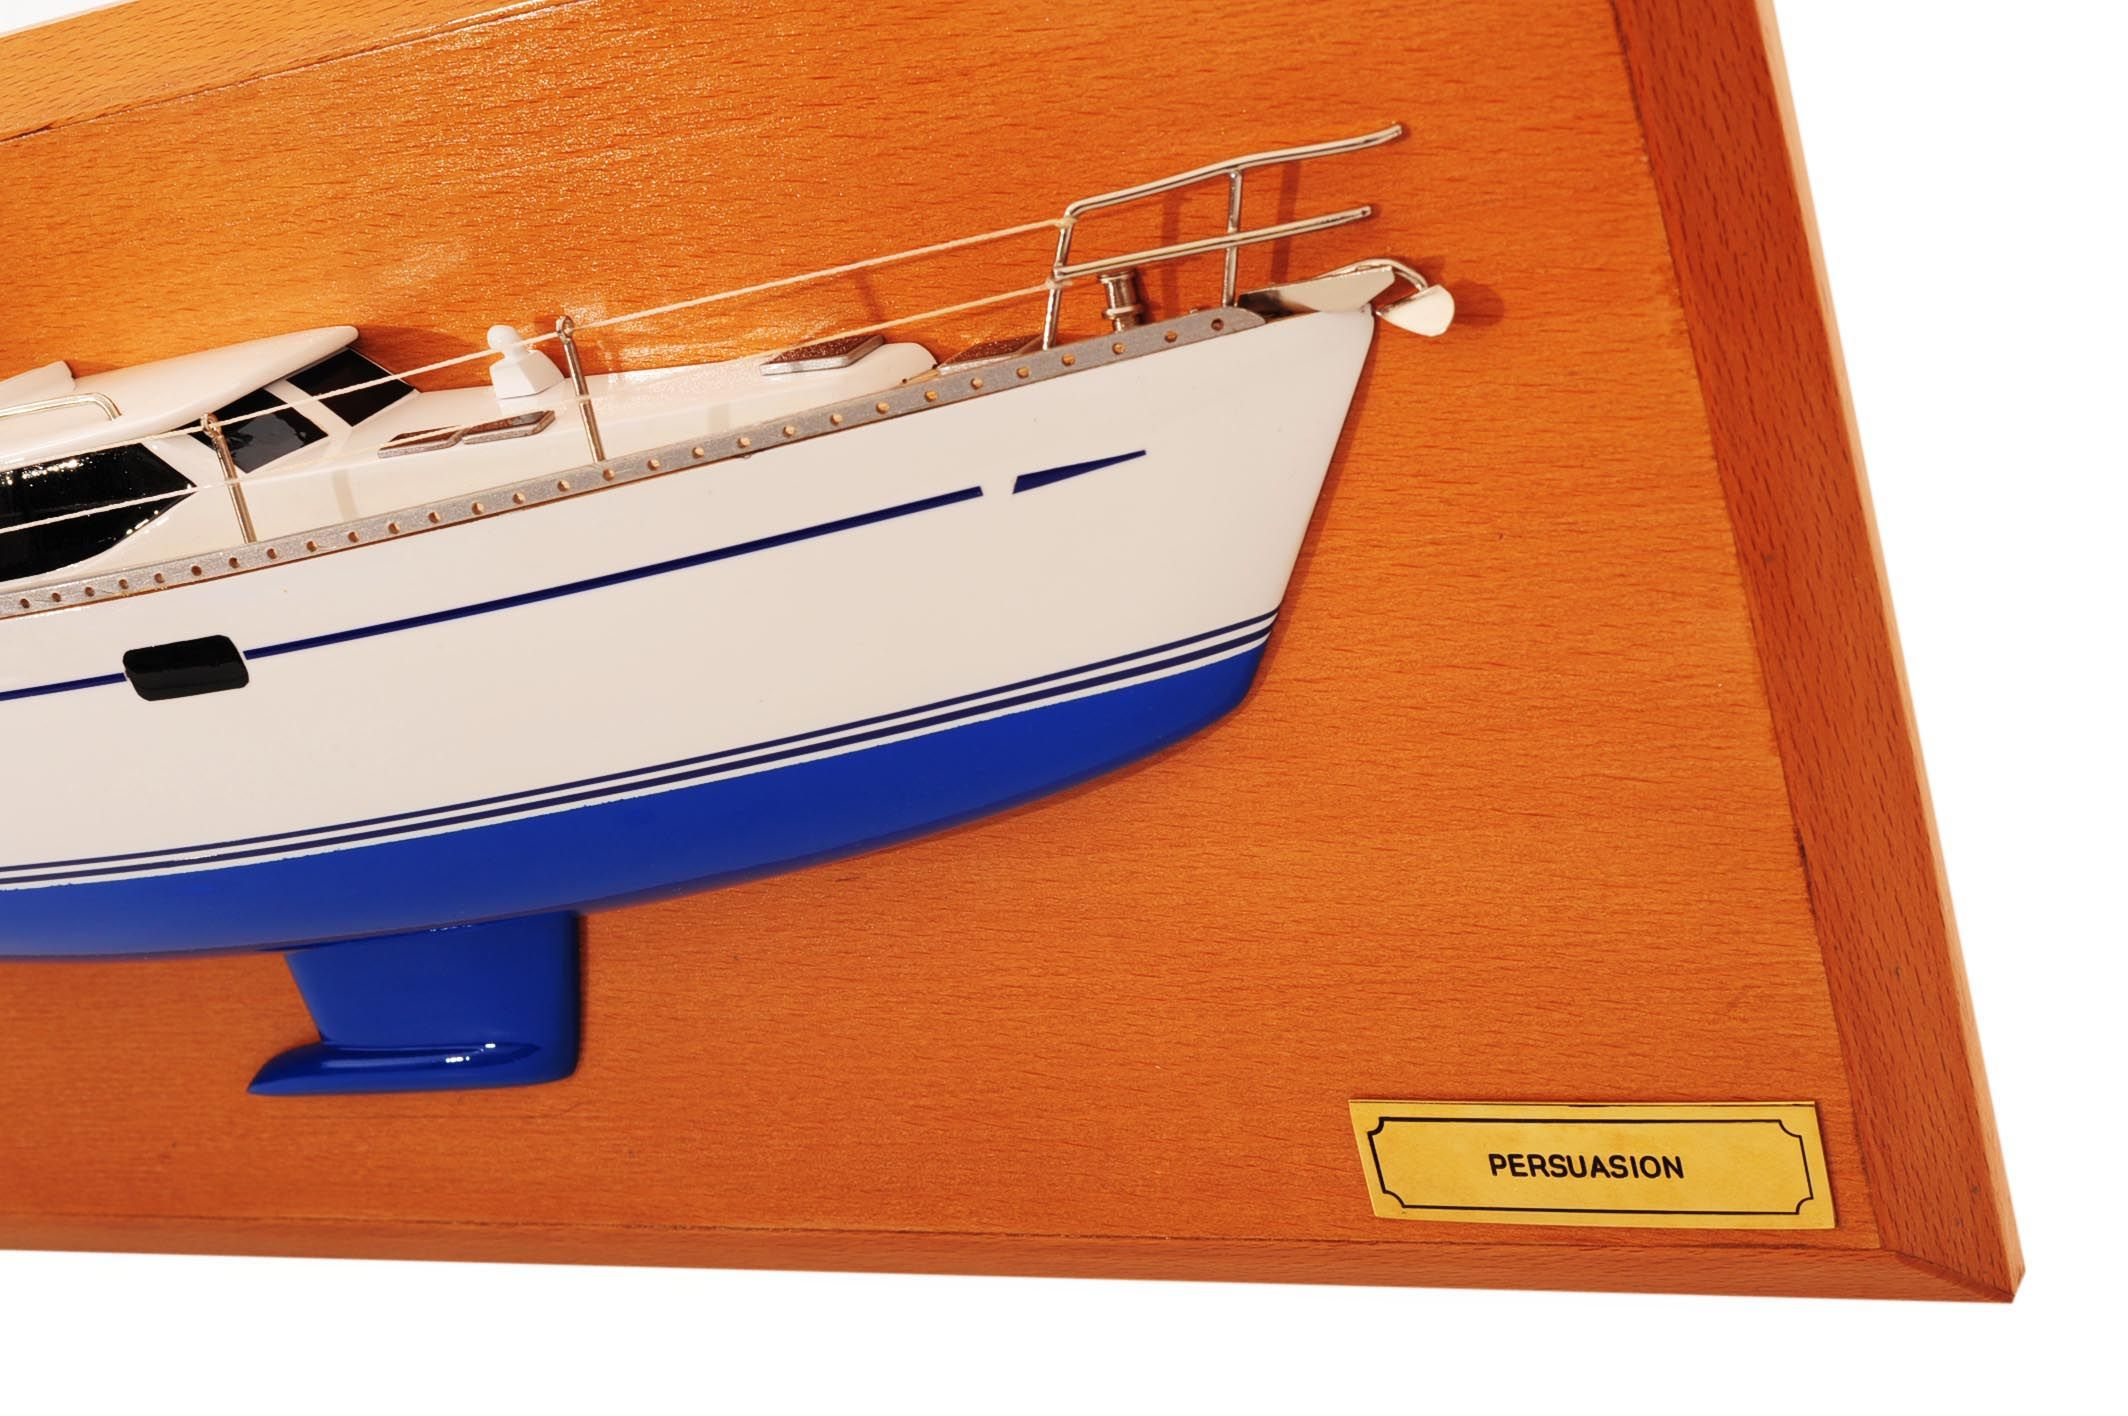 1482-8777-Oyster-45-Persuasion-Half-Model